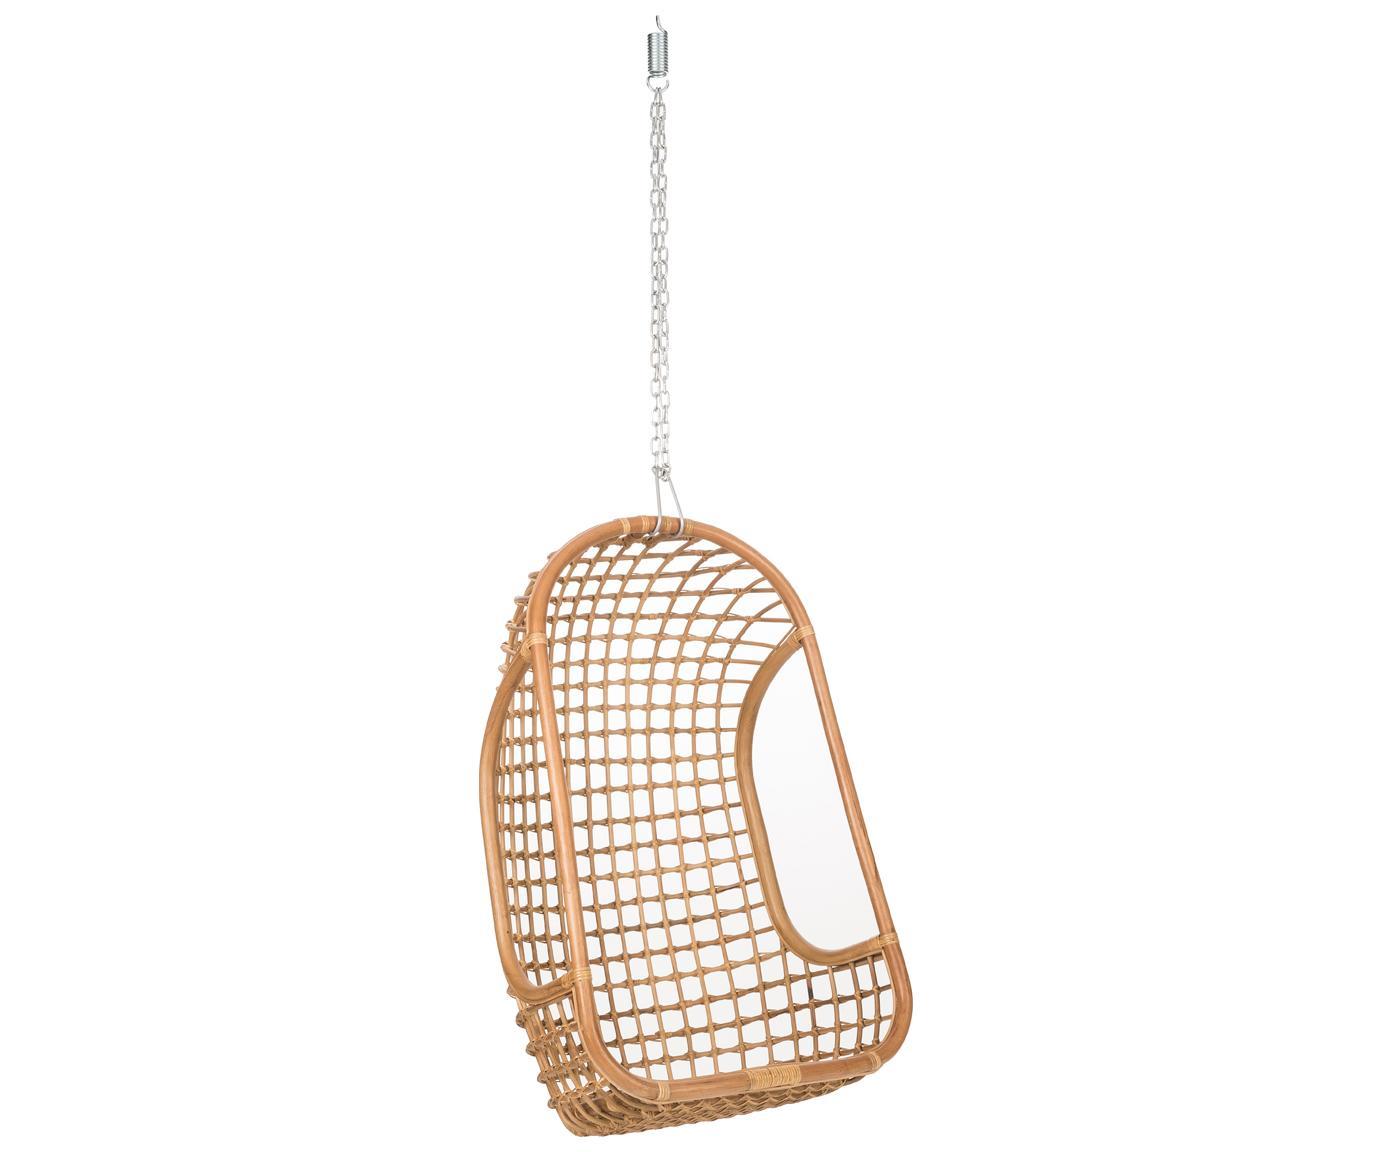 Sedia a poltrona sospesa Swing, Rattan, Larg. 72 cm x Alt. 110 cm